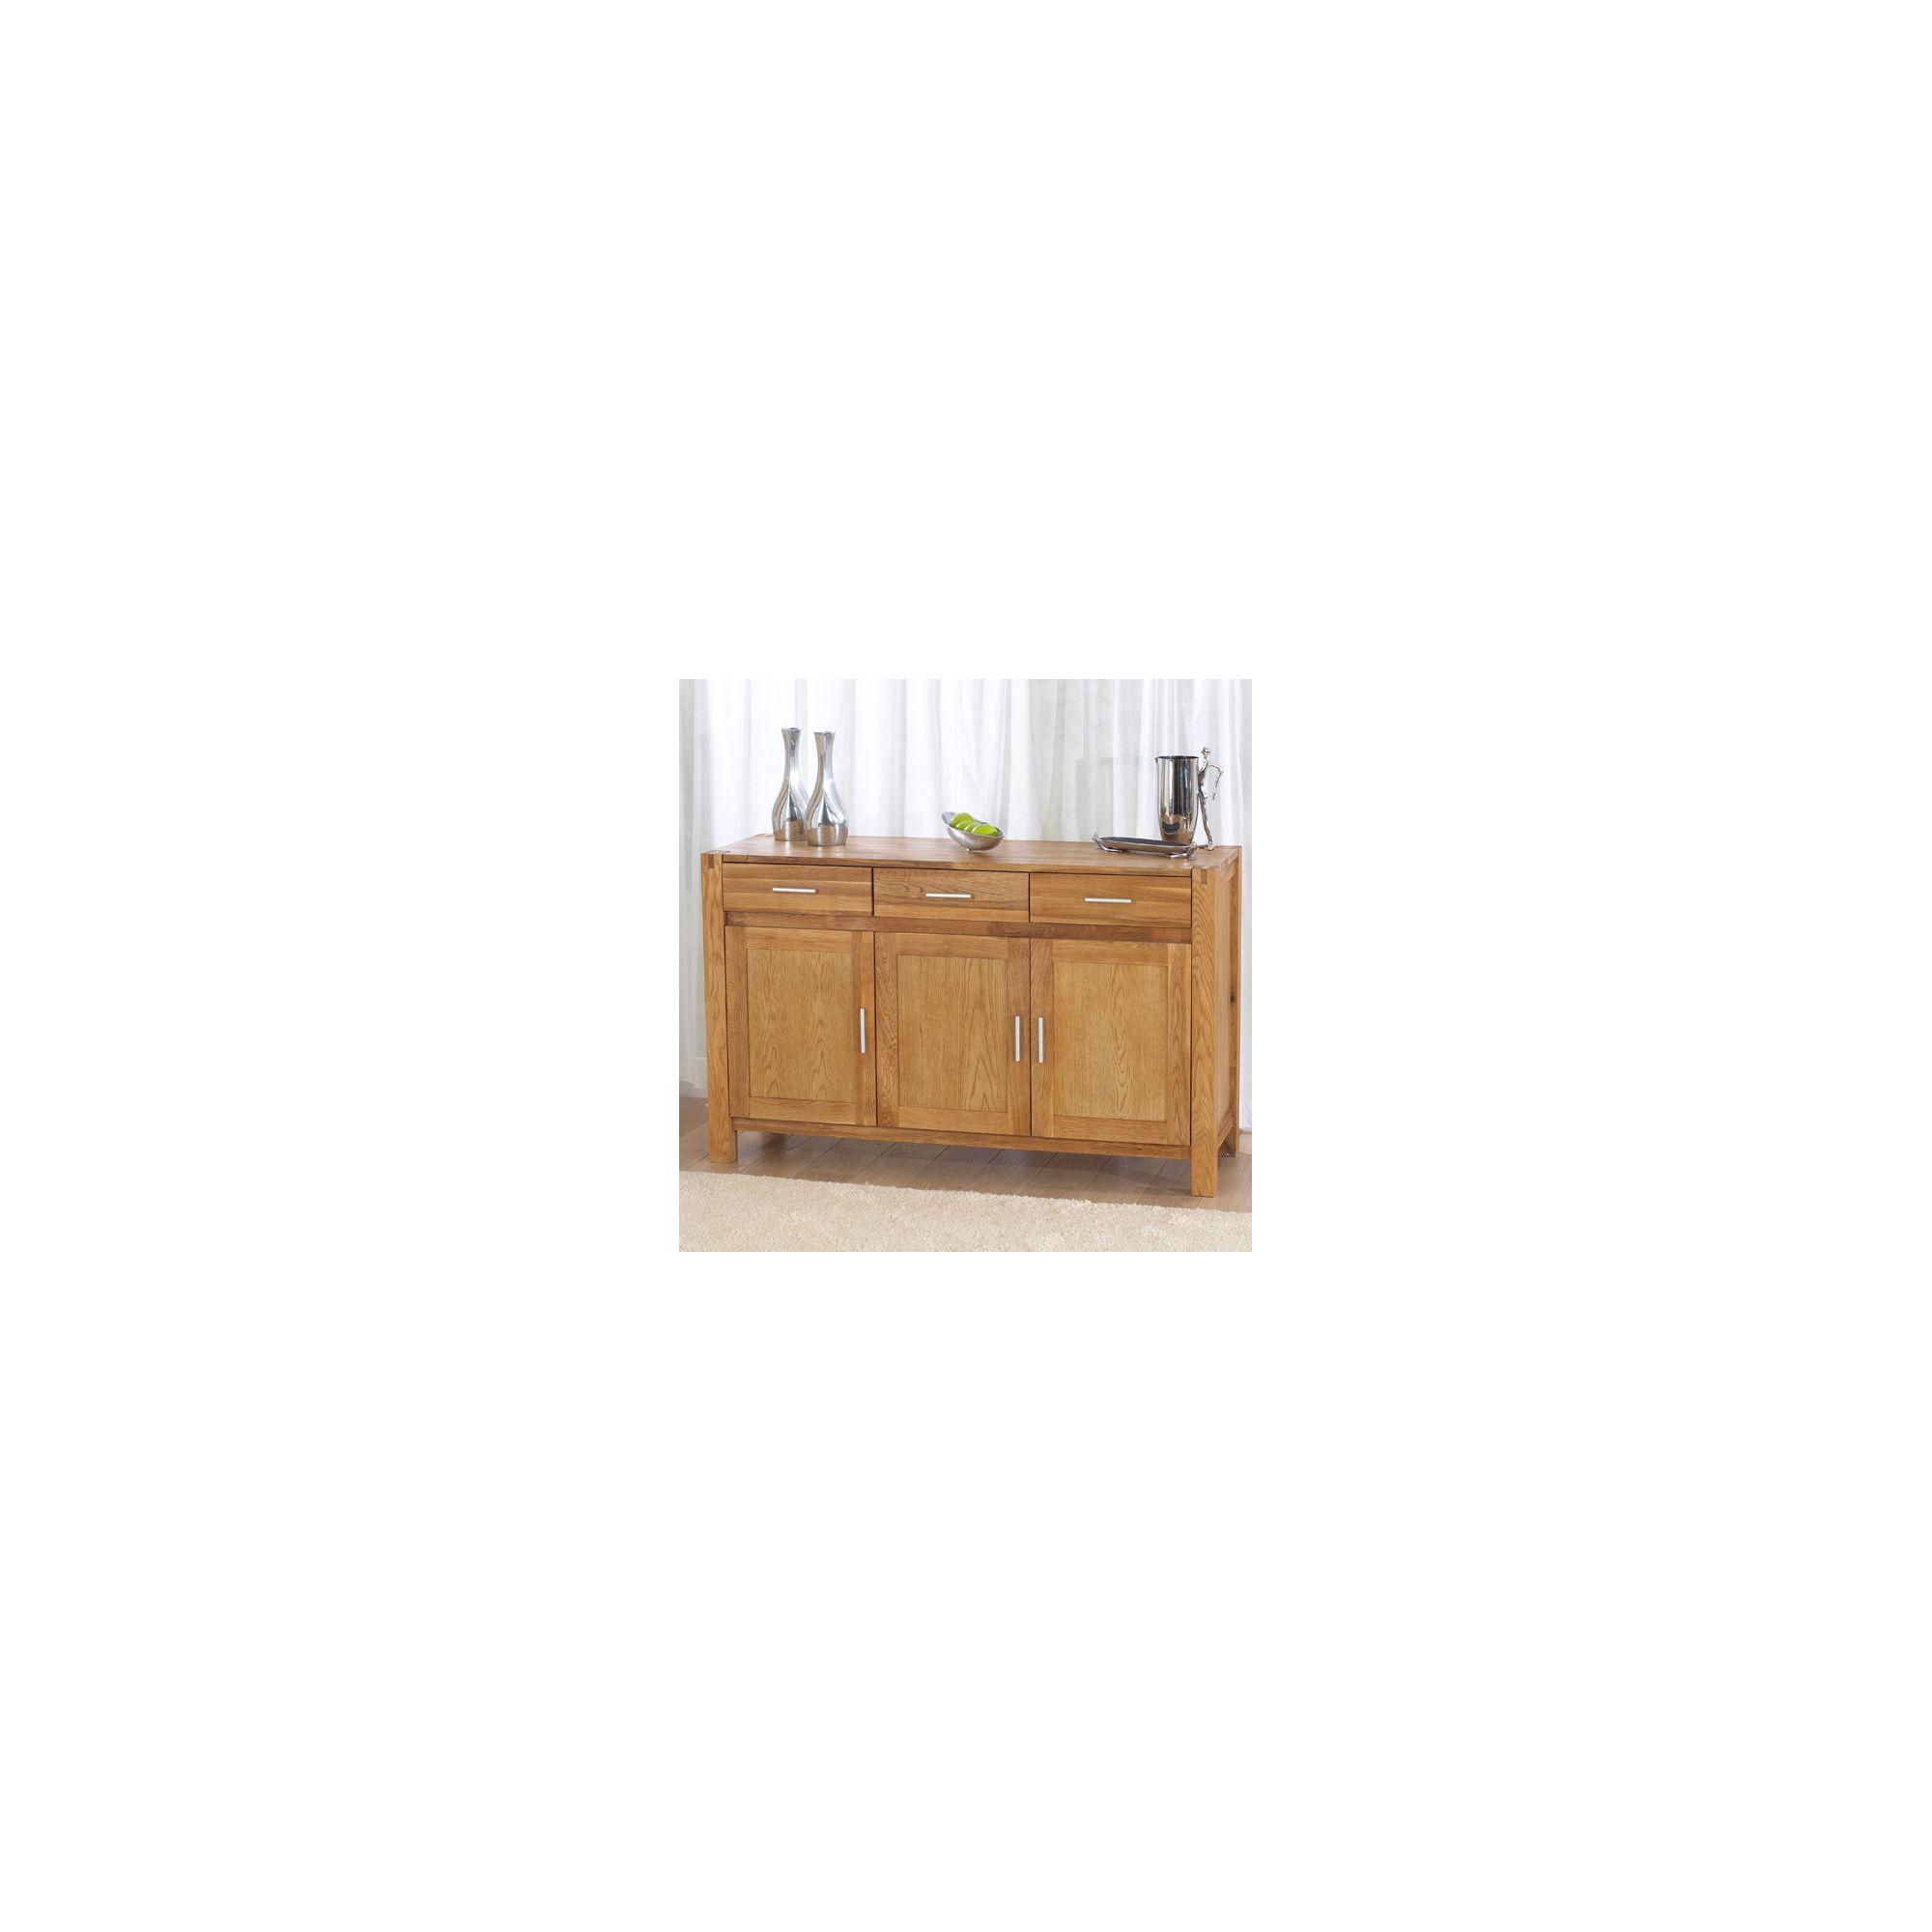 Mark Harris Furniture Verona Oak Sideboard - Large at Tesco Direct